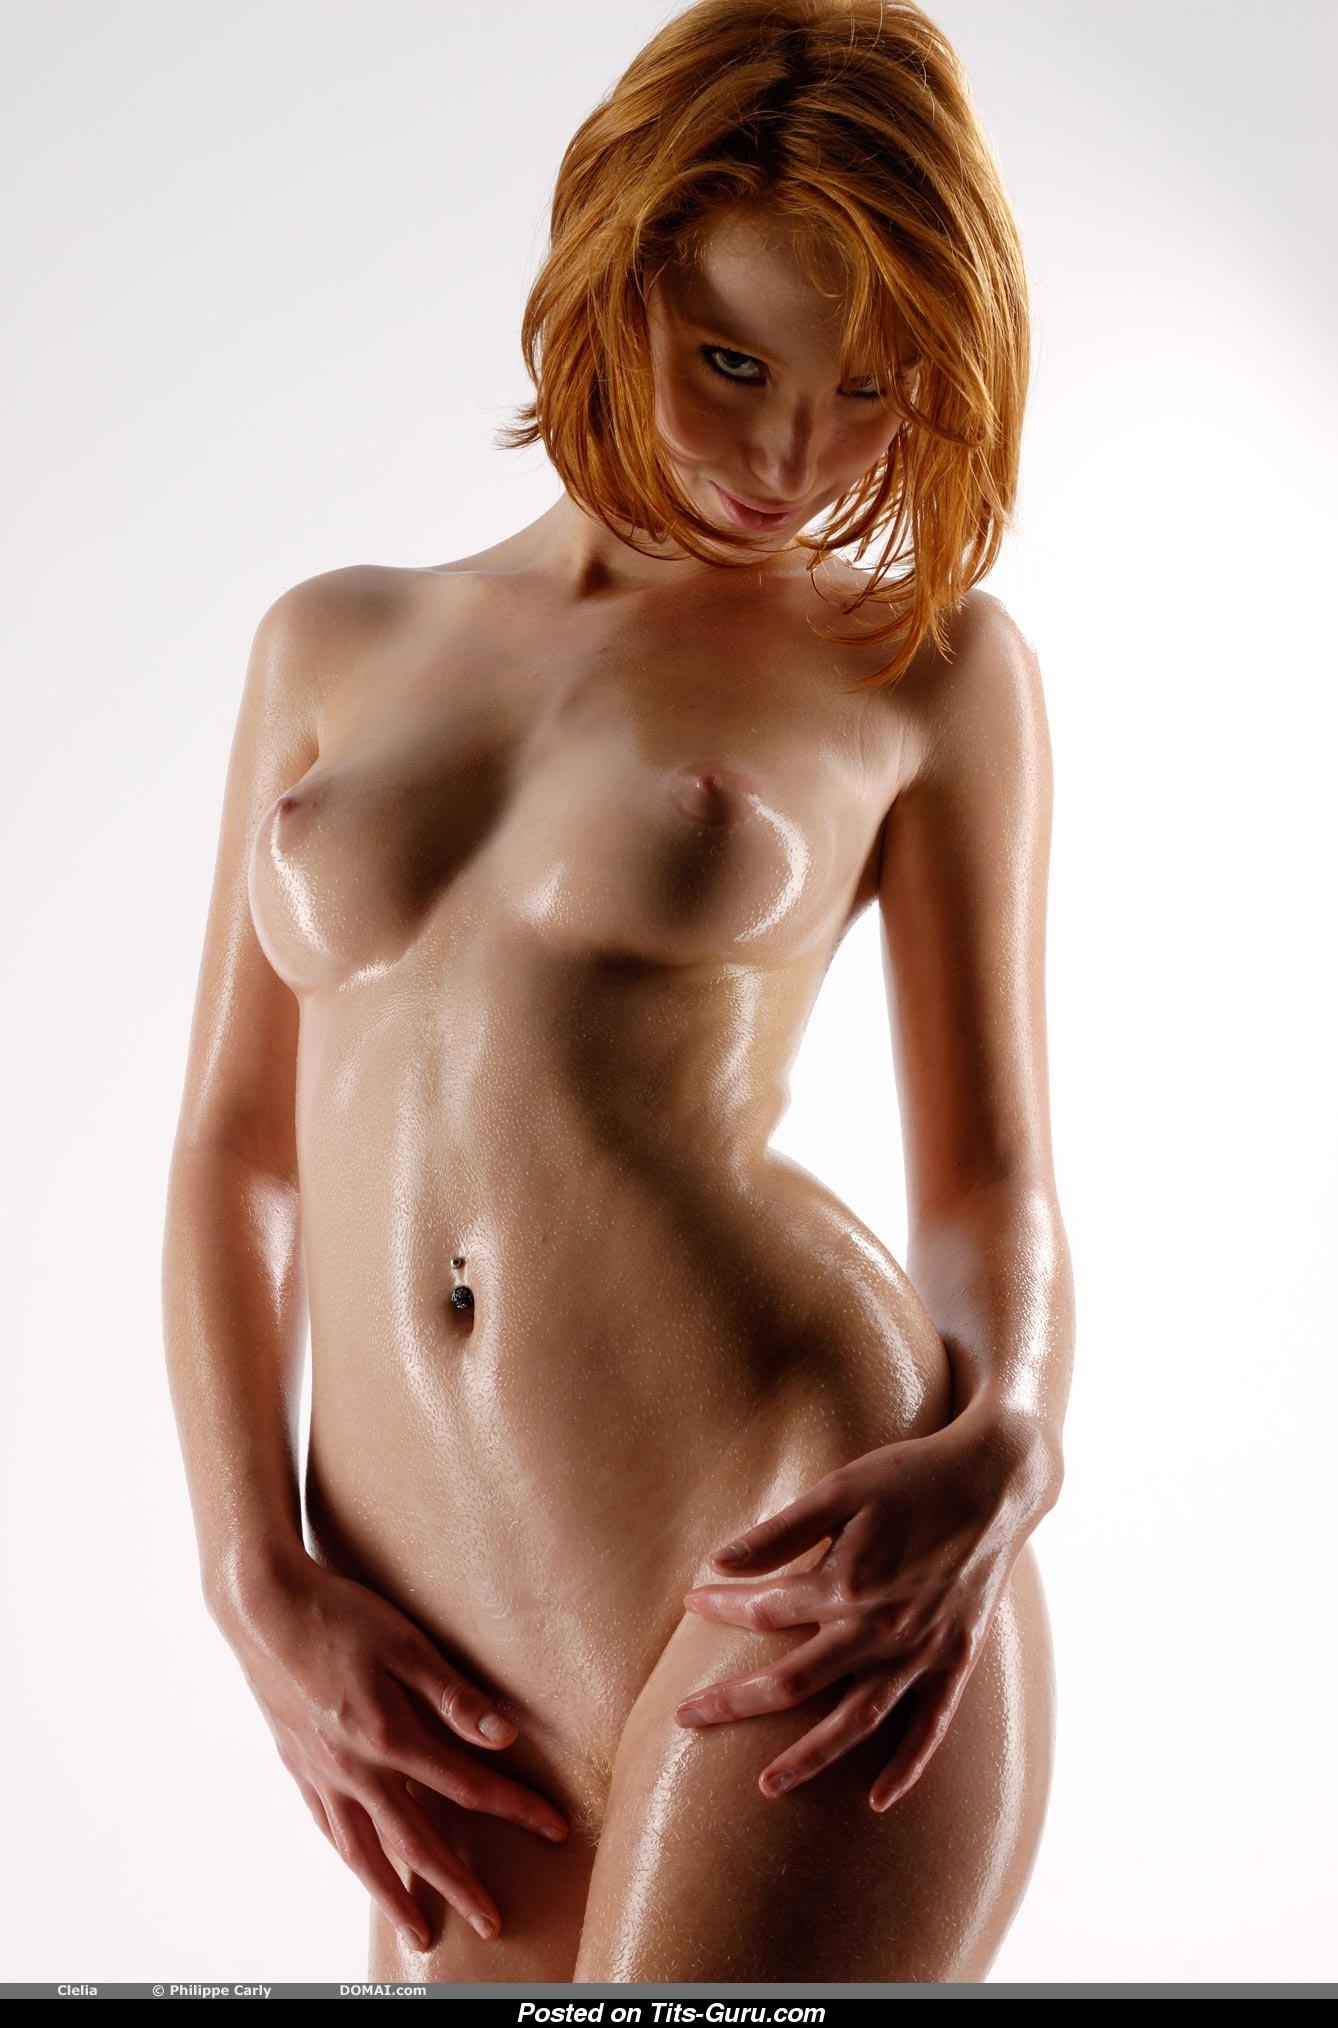 Free public nude flashing adult voyeur